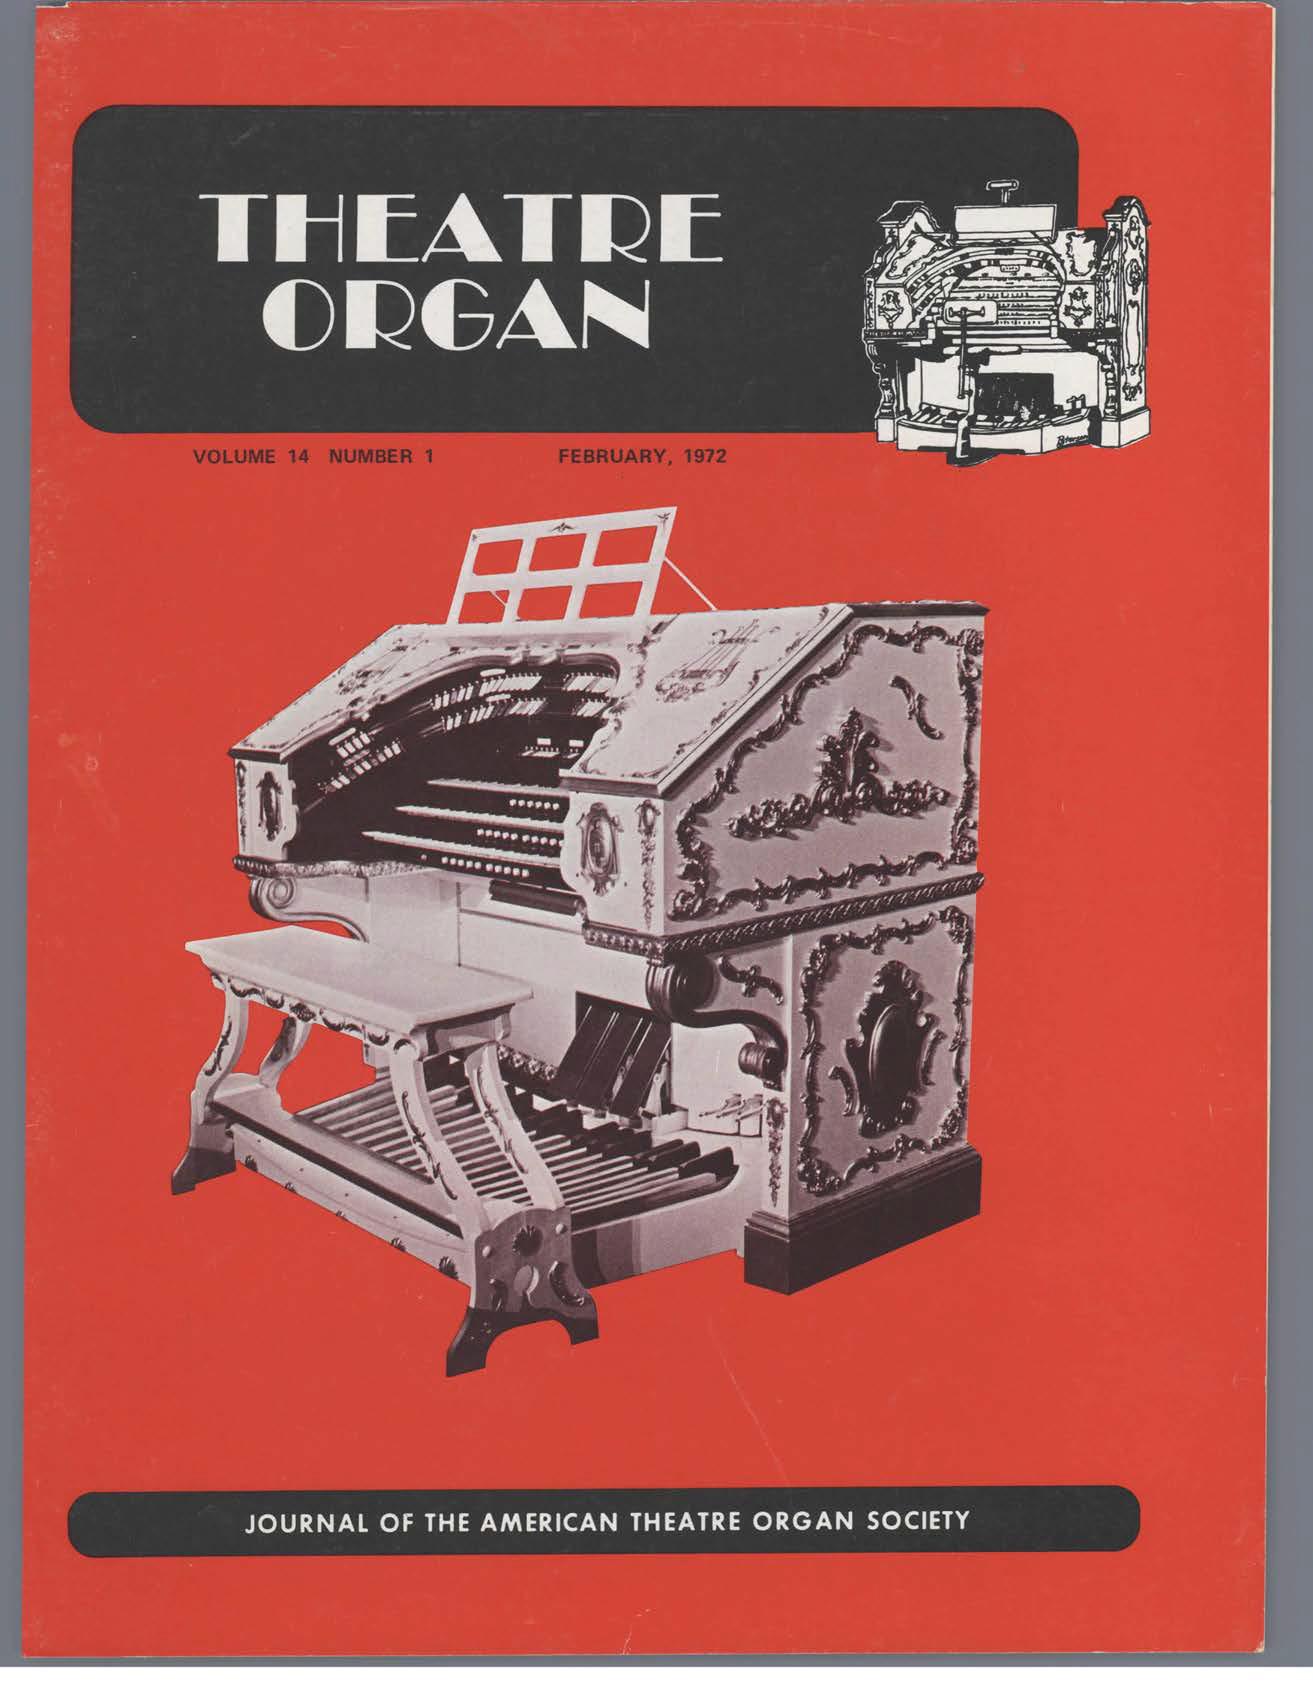 Theatre Organ, February 1972, Volume 14, Number 1